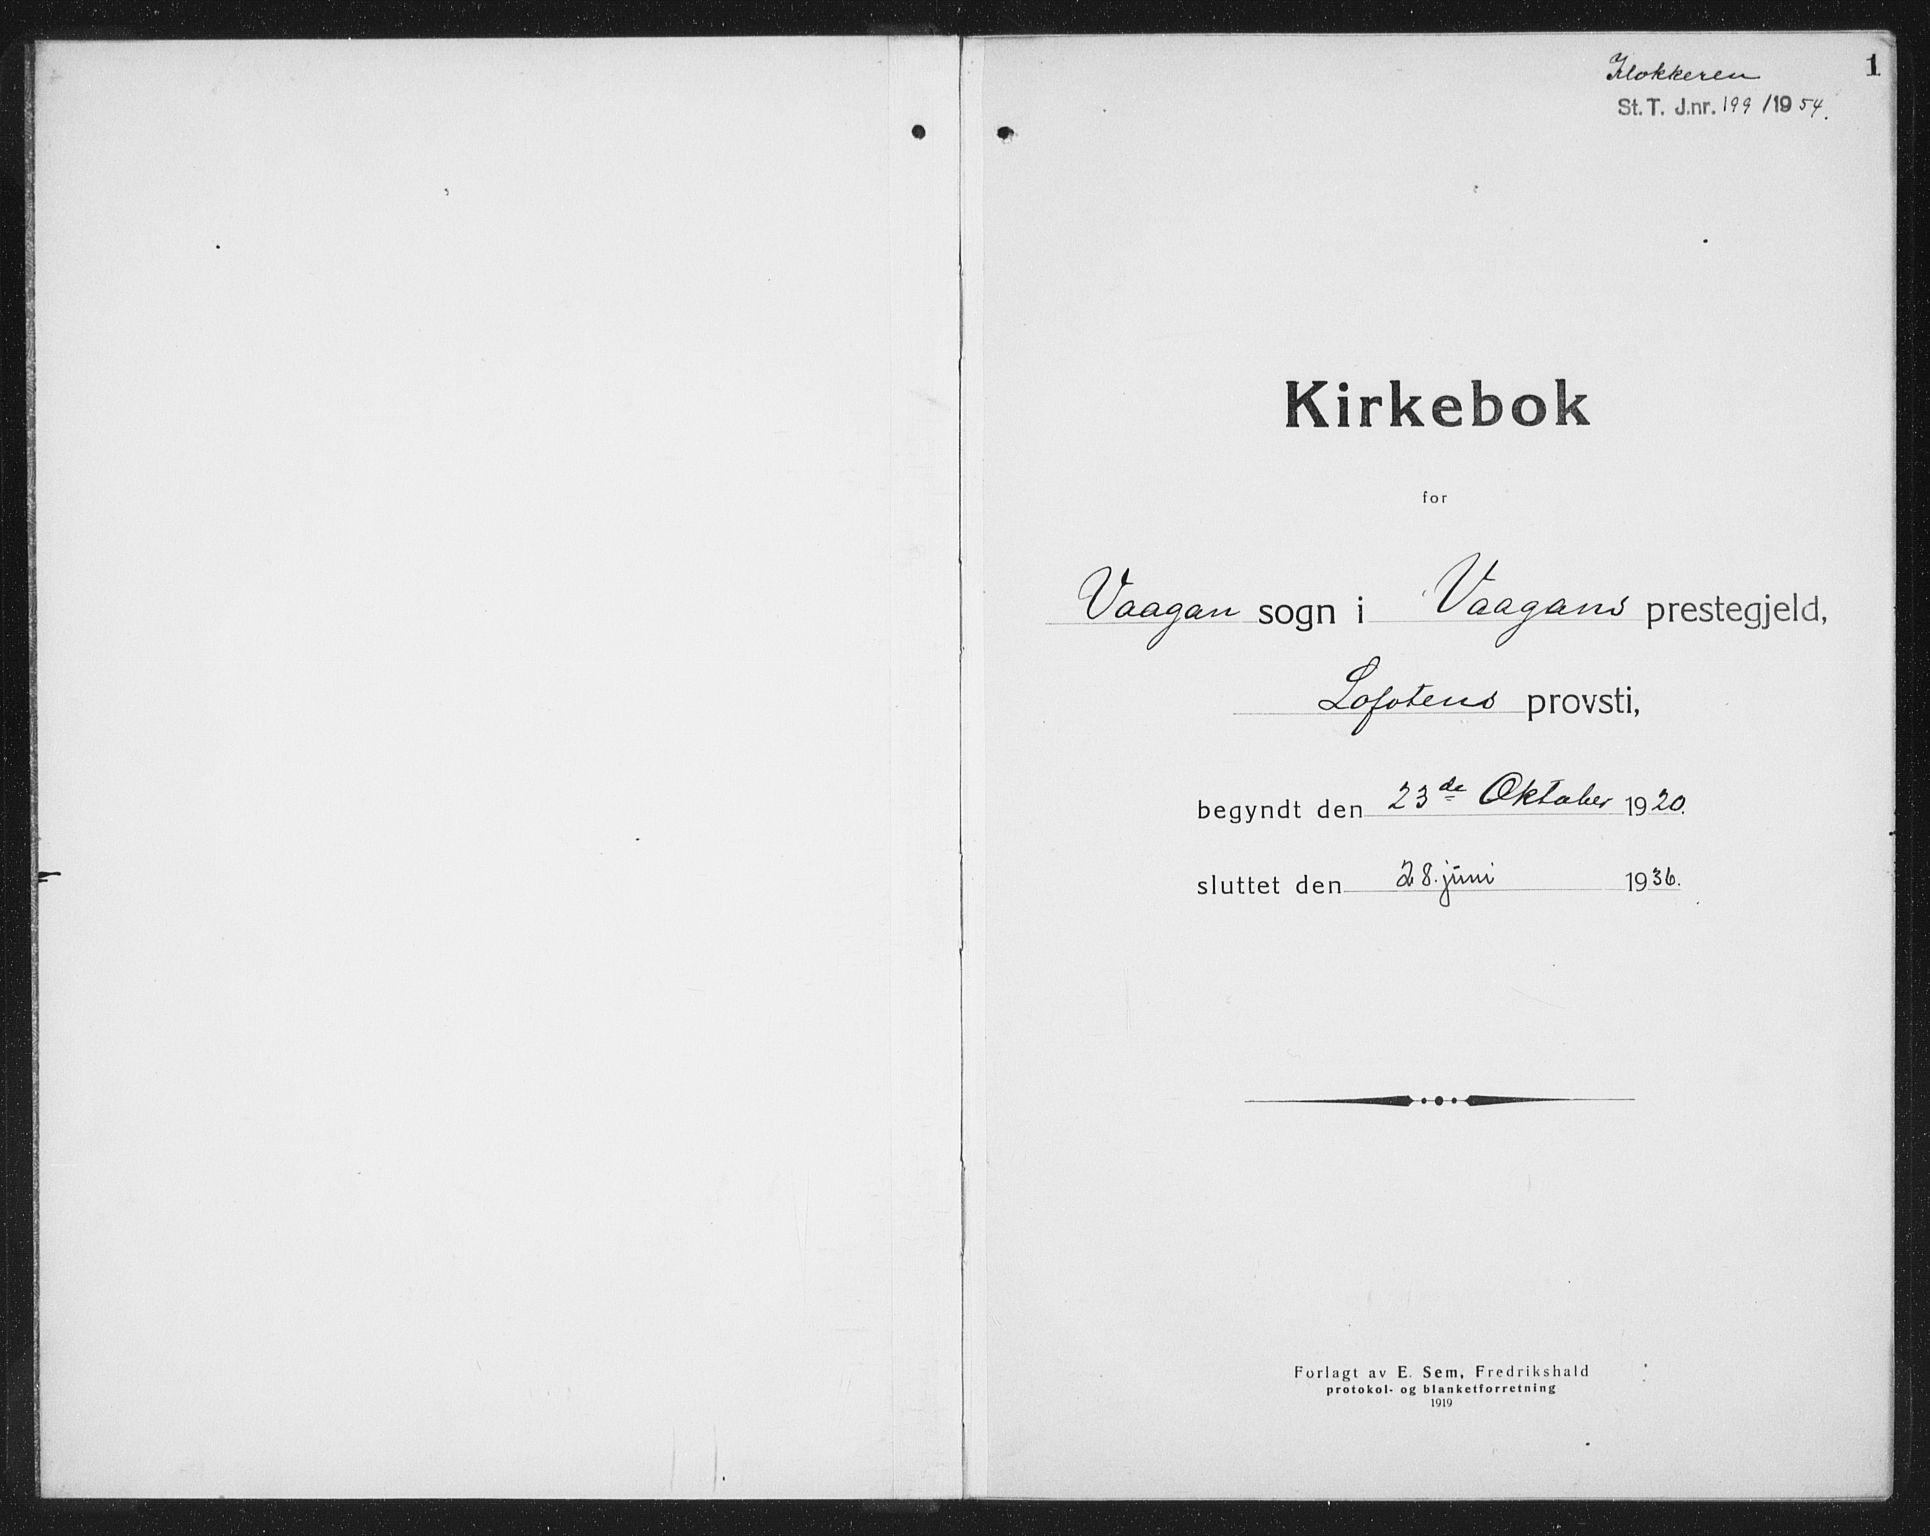 SAT, Ministerialprotokoller, klokkerbøker og fødselsregistre - Nordland, 874/L1083: Klokkerbok nr. 874C12, 1920-1936, s. 1